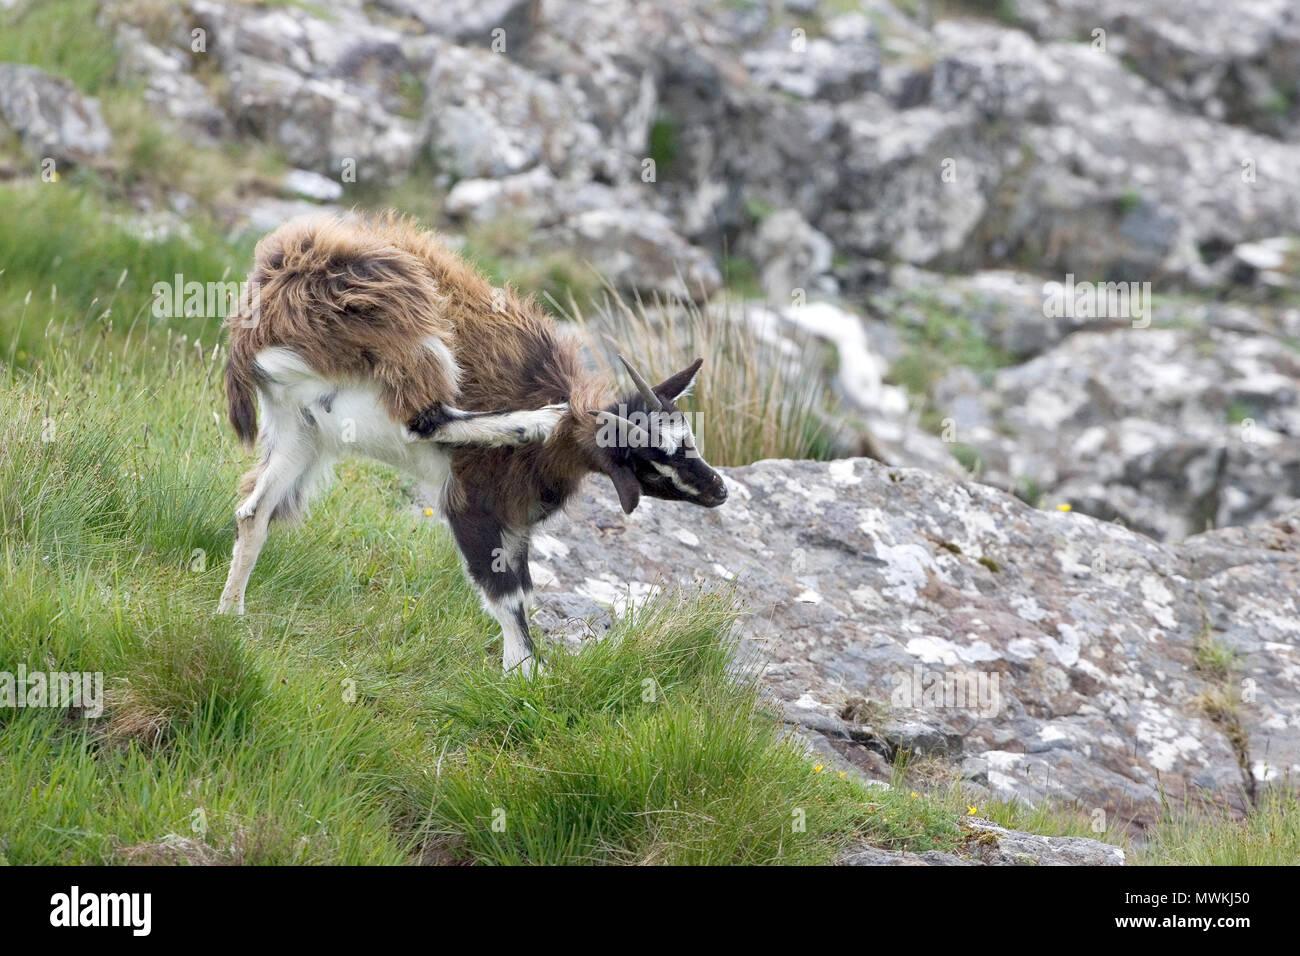 Feral goat Capra hircus female scratching on rocky coast, Grasspoint